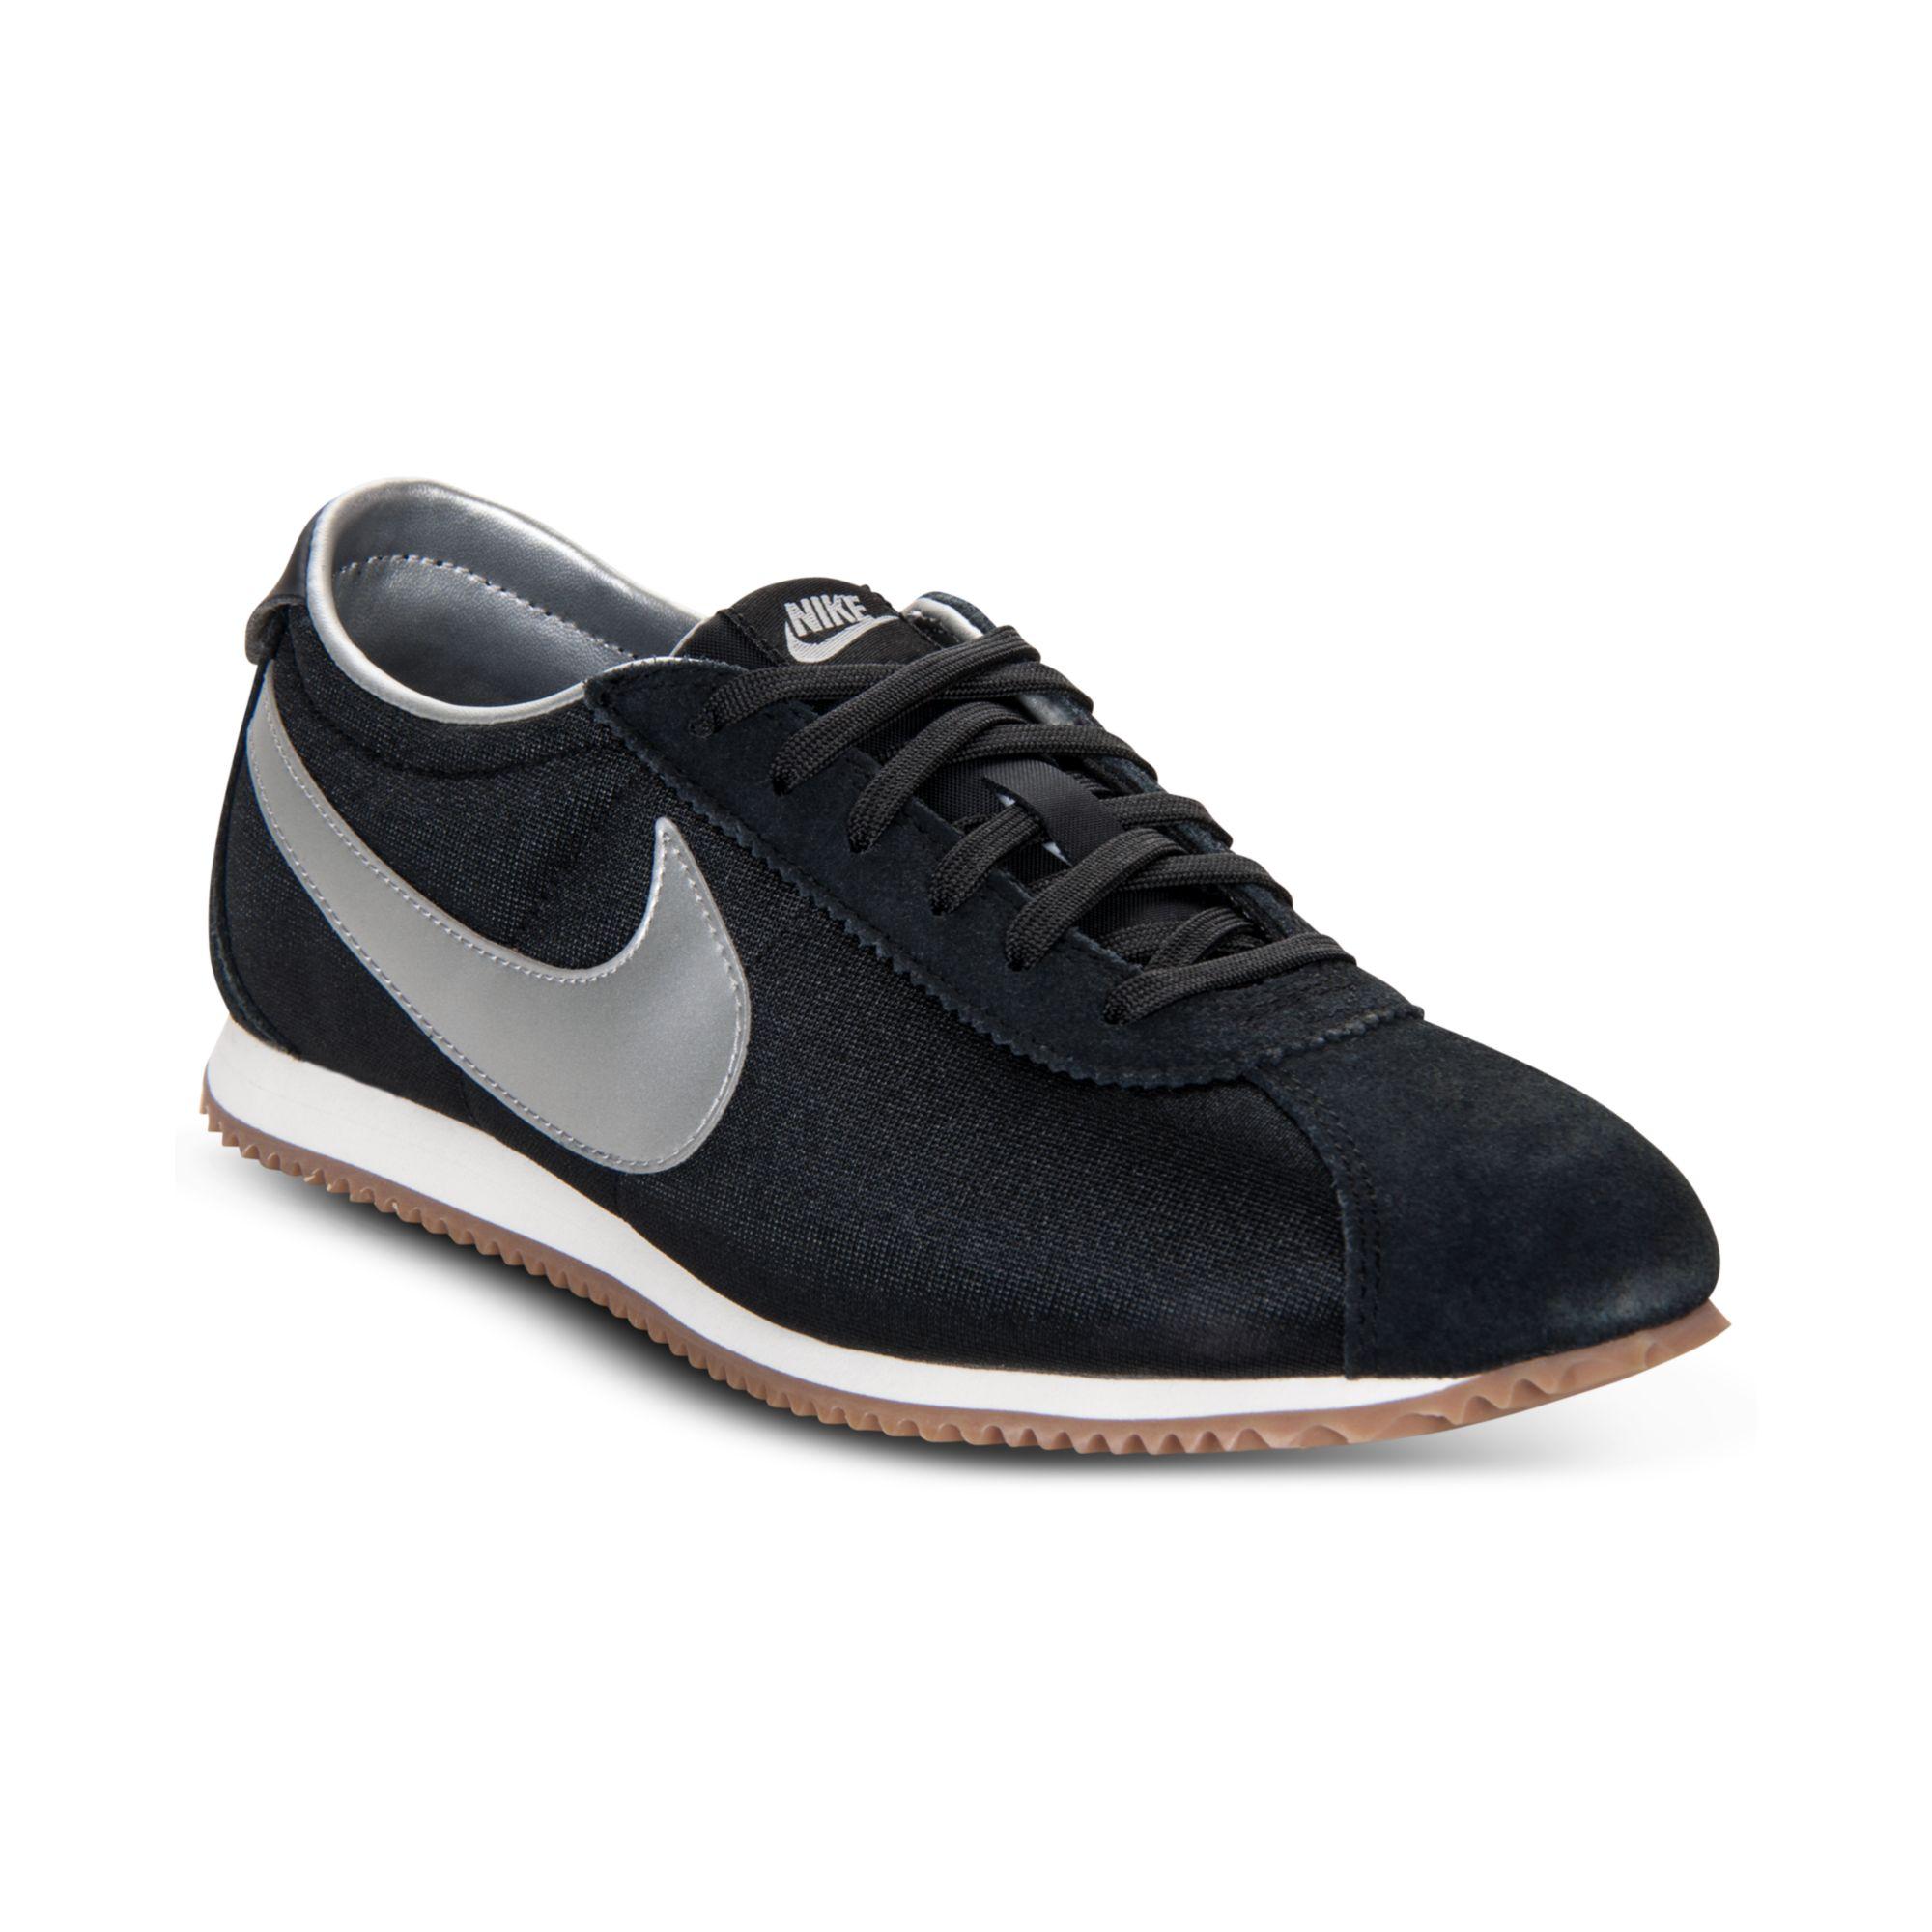 huge discount 7d00a 838d9 ... spain lyst nike cortez lite txt casual sneakers in black ff305 08a1b